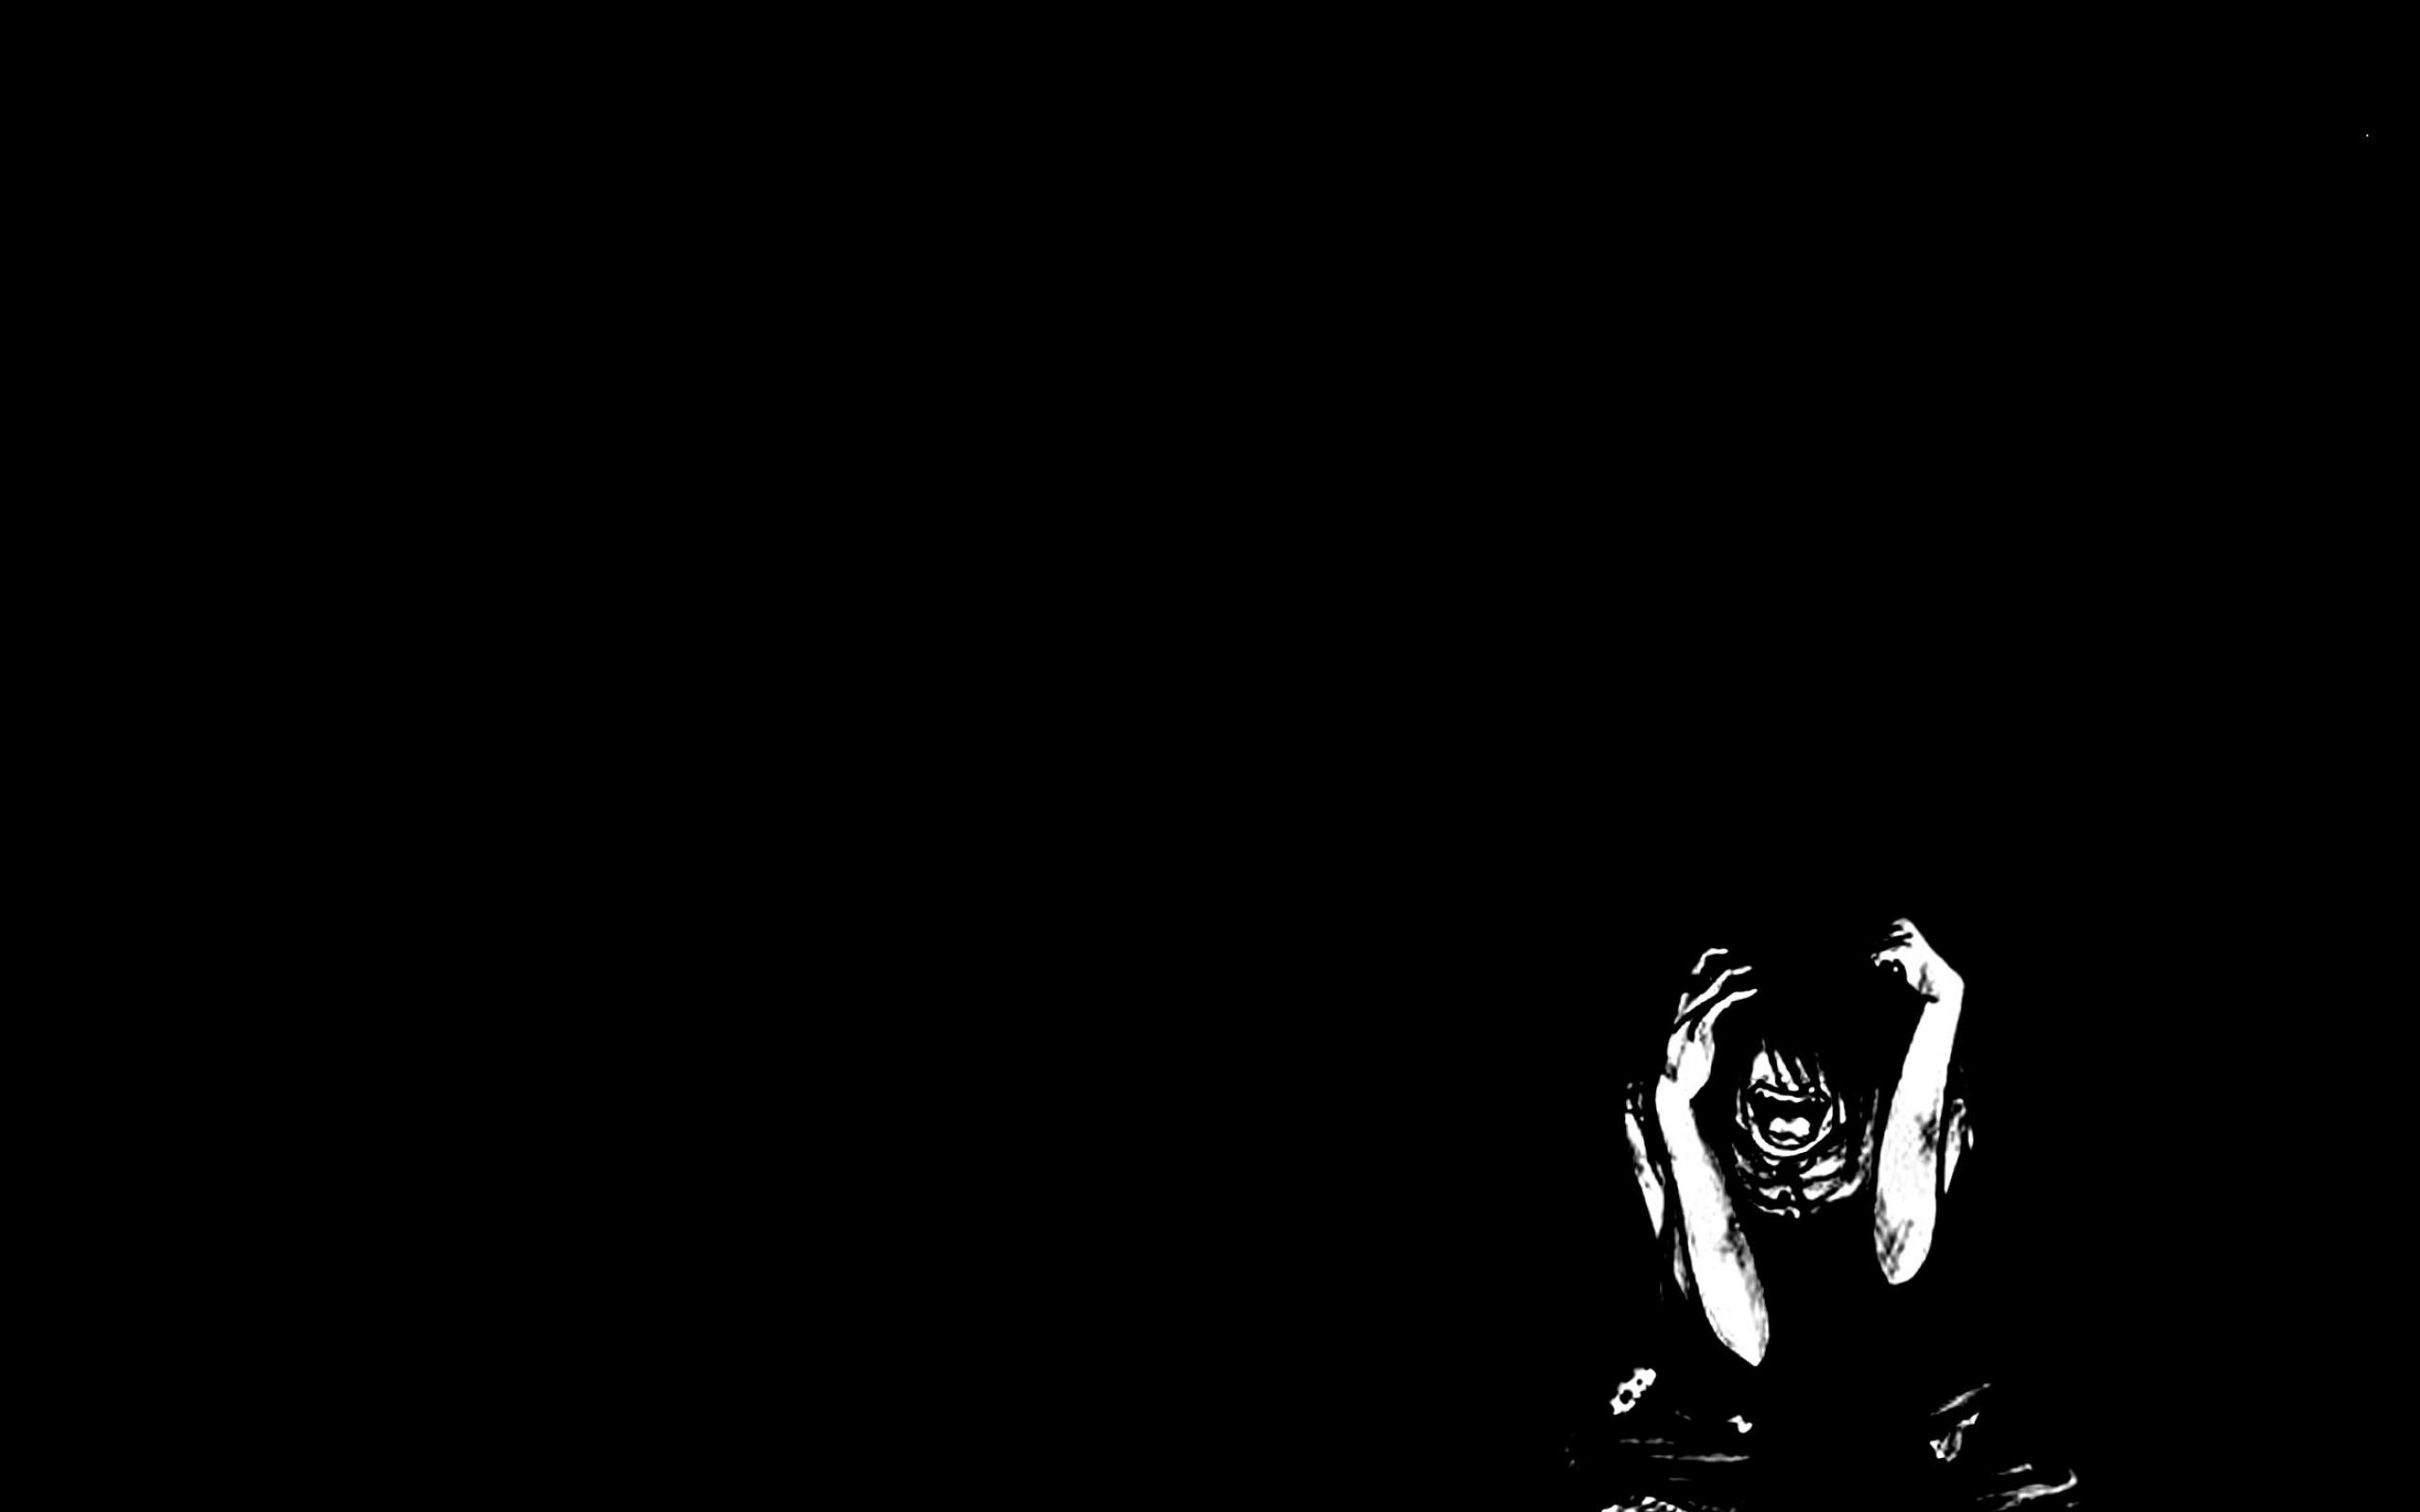 insane madness black background 2338×1700 wallpaper Art HD Wallpaper